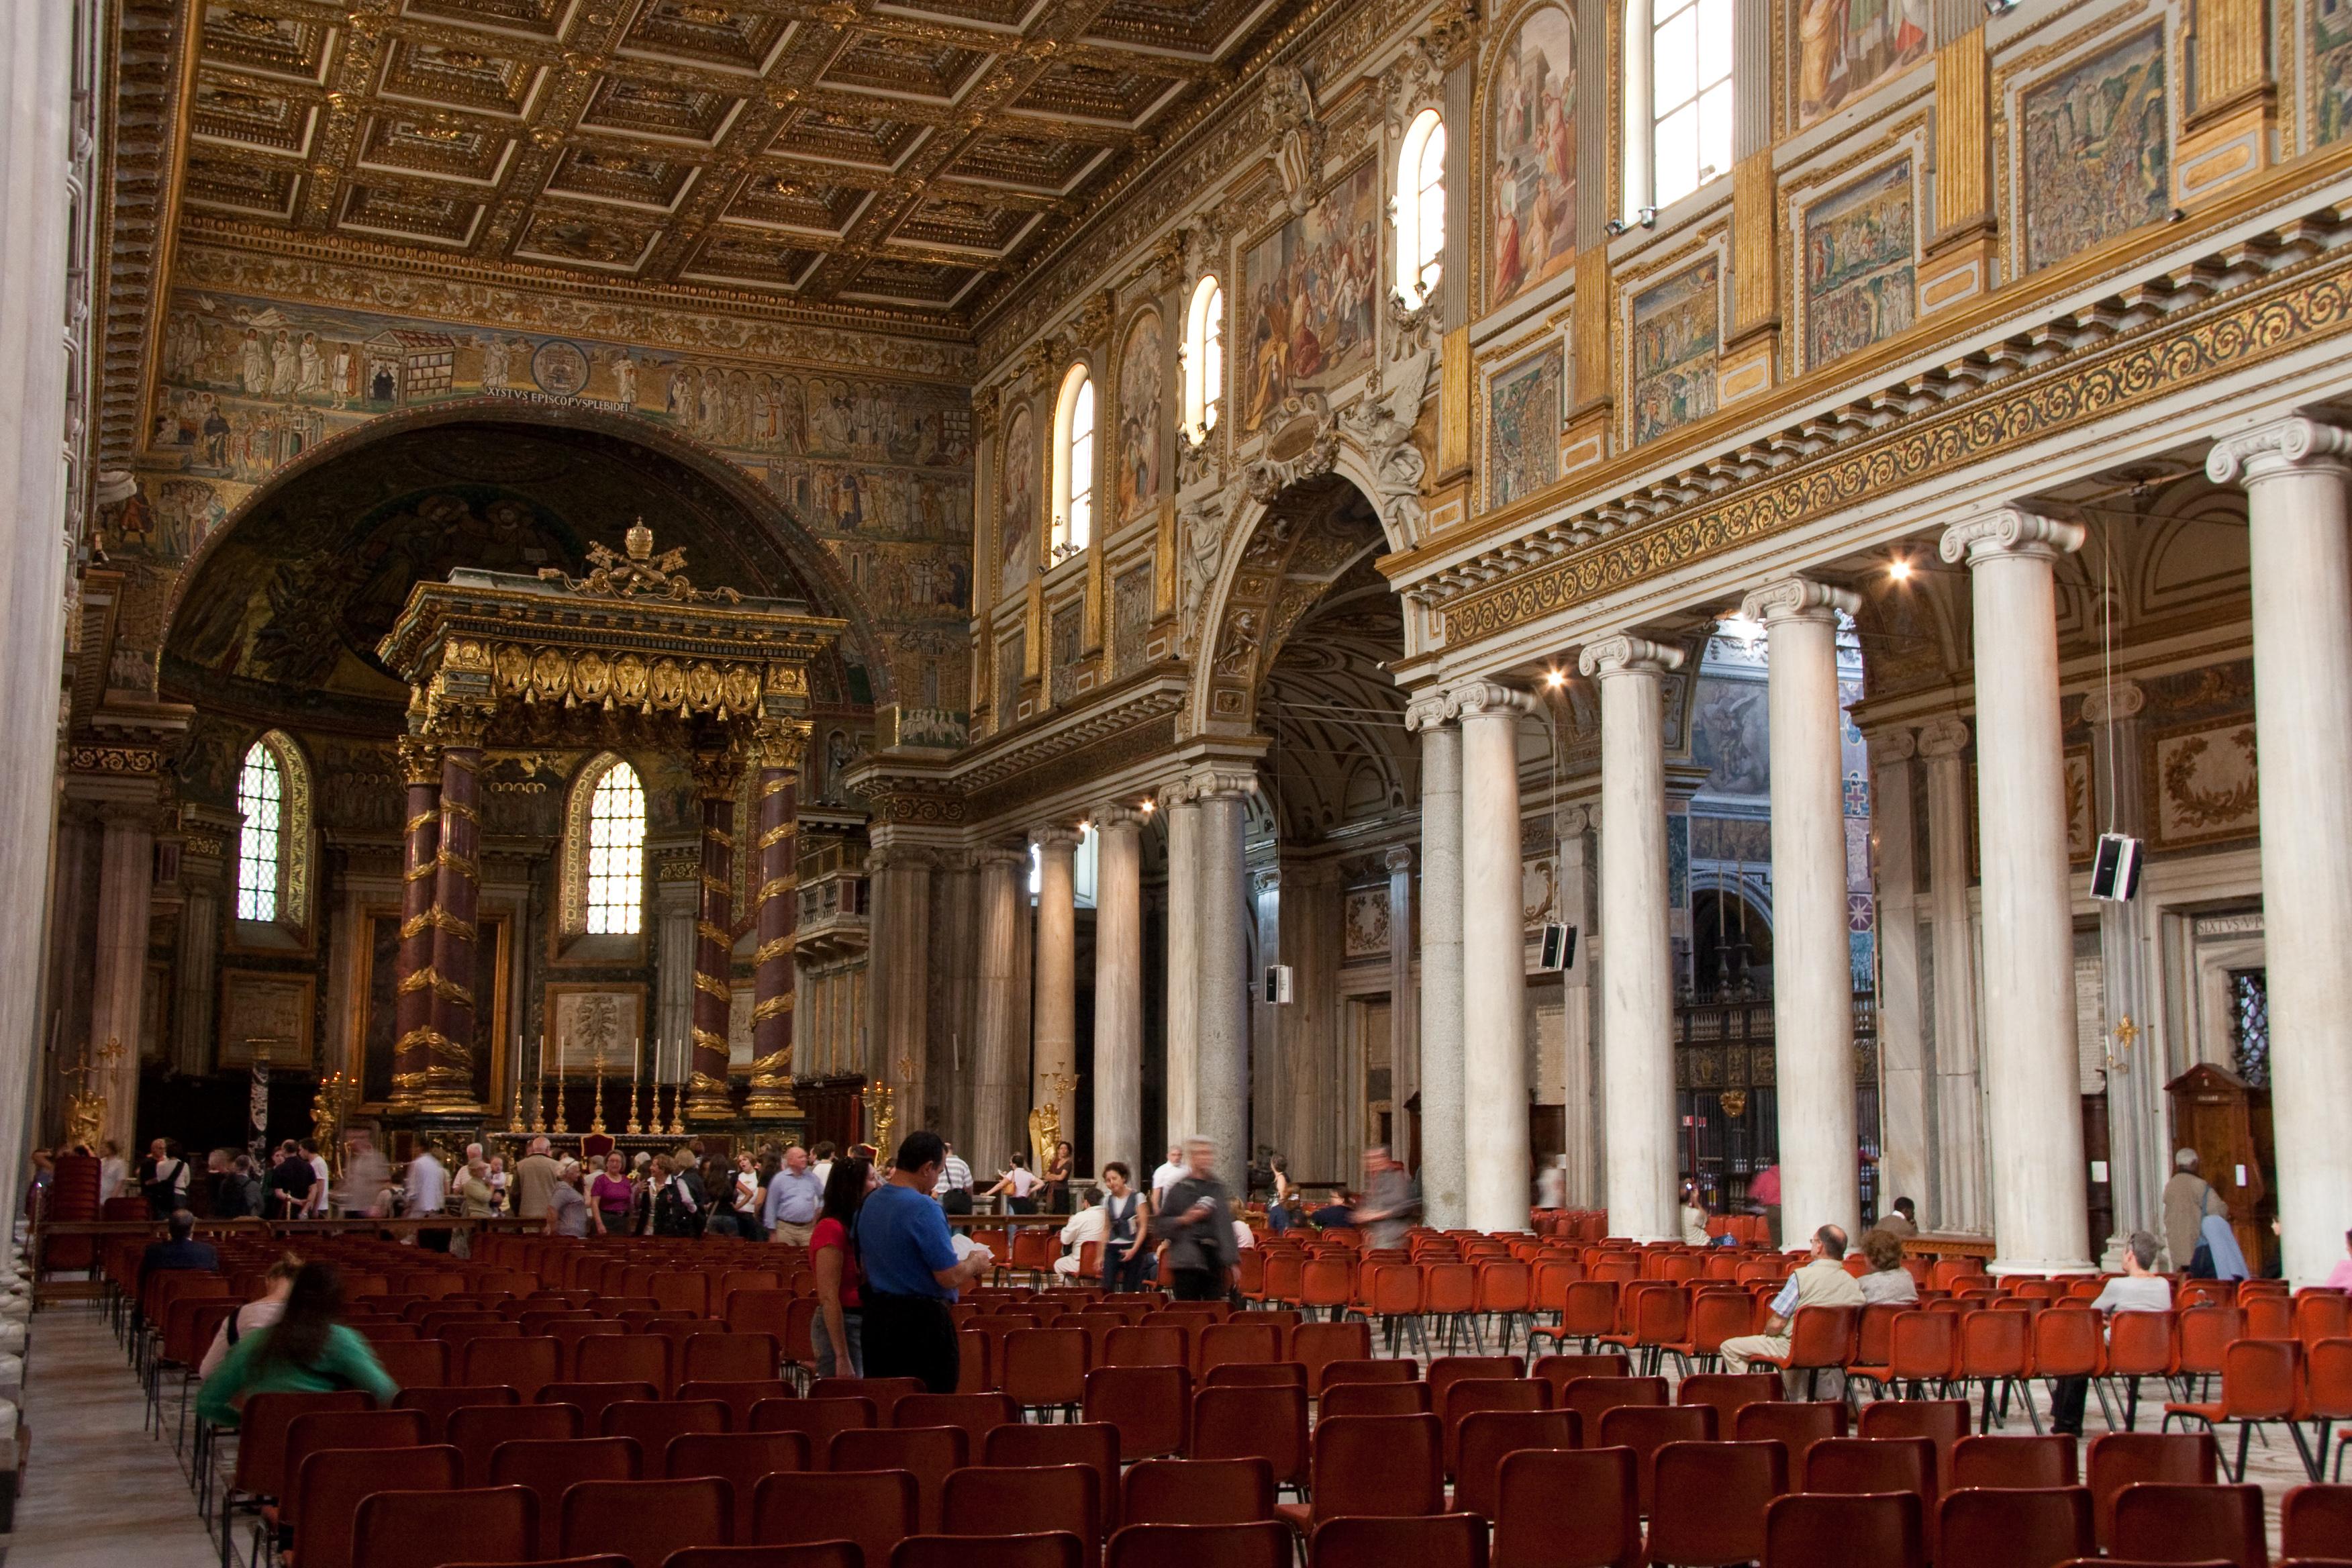 Imagini pentru Basilica sANTA mARIA mAGGIORE